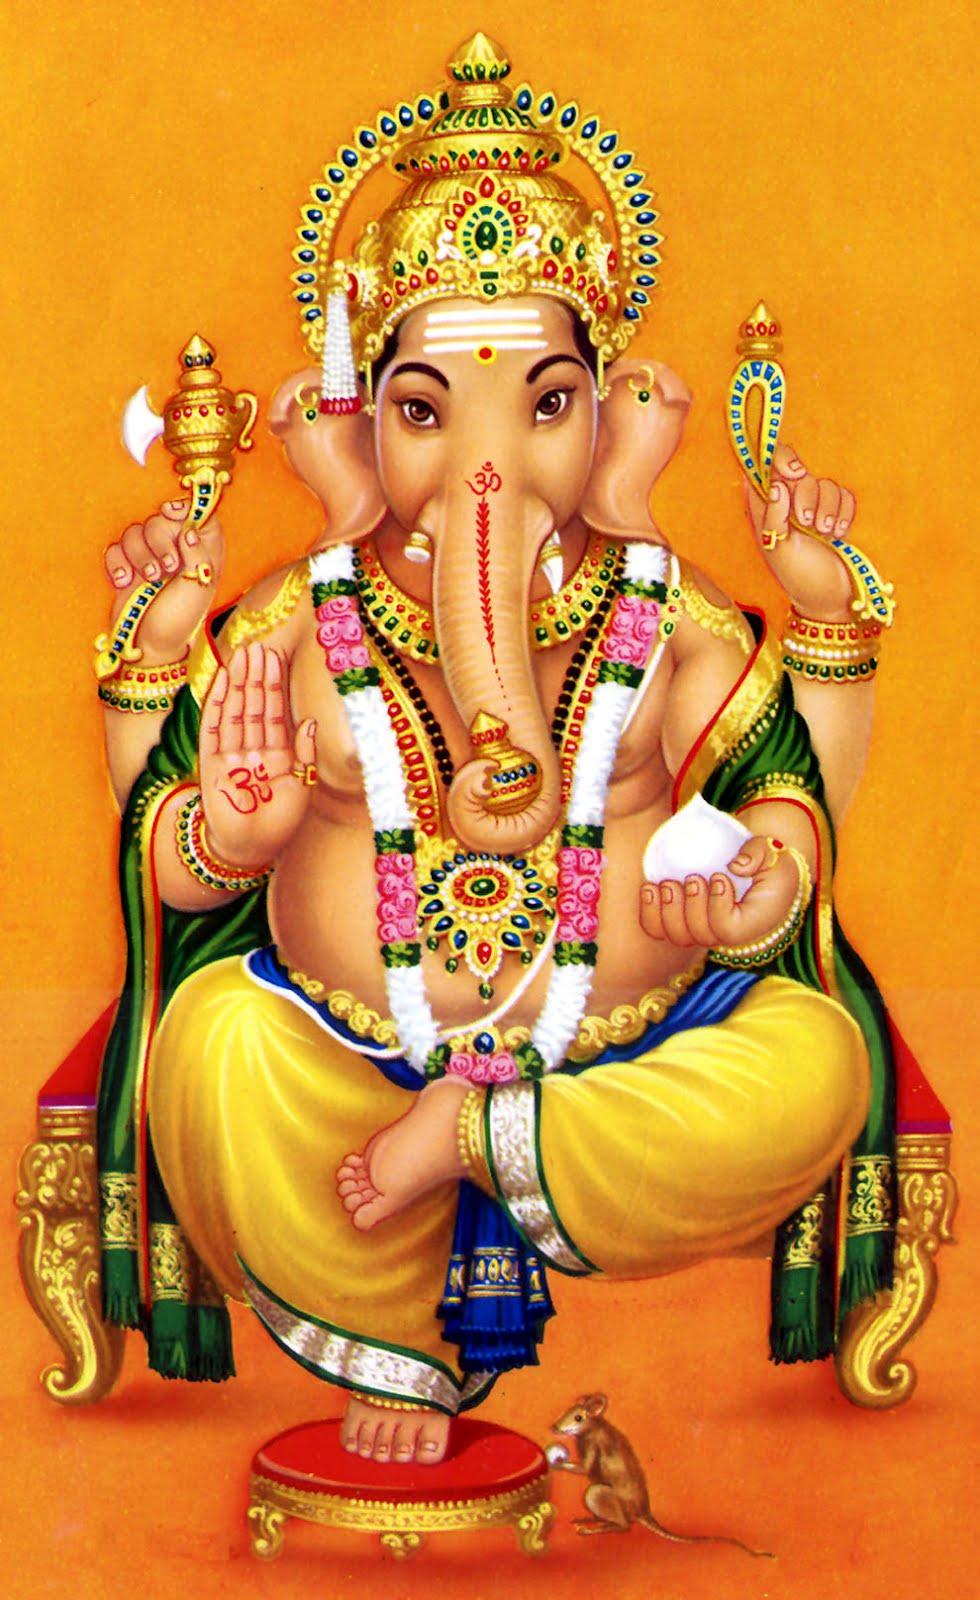 Bhagwan ji help me bautiful wallpapers collection of lord ganesh pictures - Shri ganesh hd photo ...